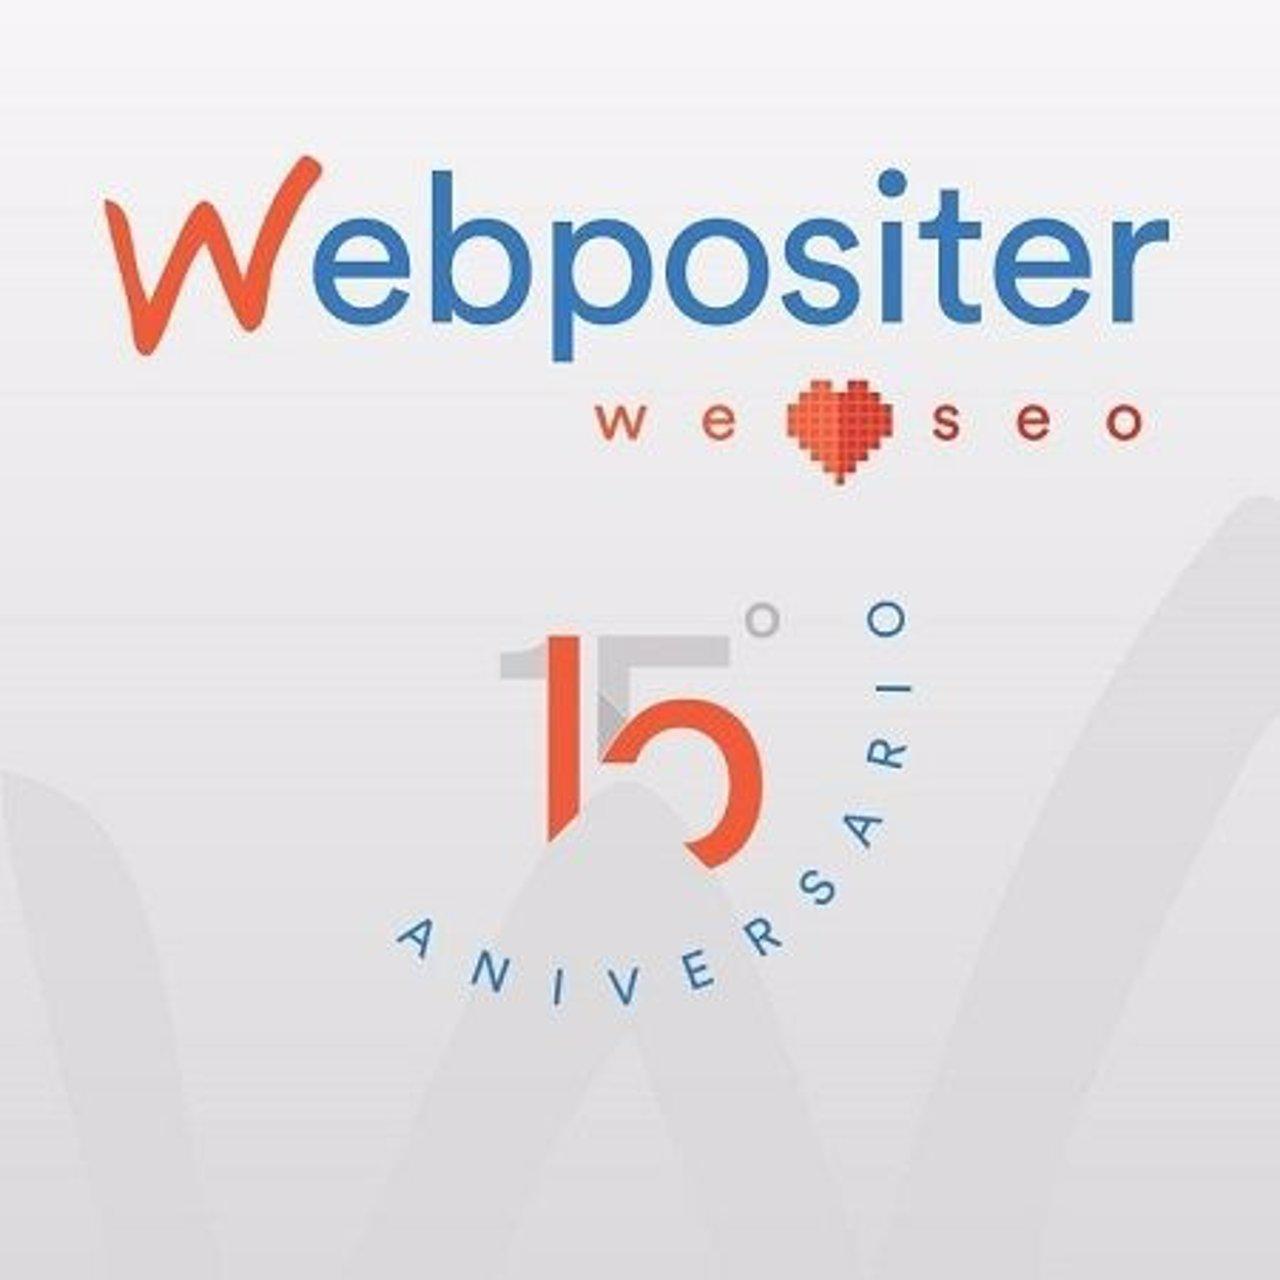 Webpositer